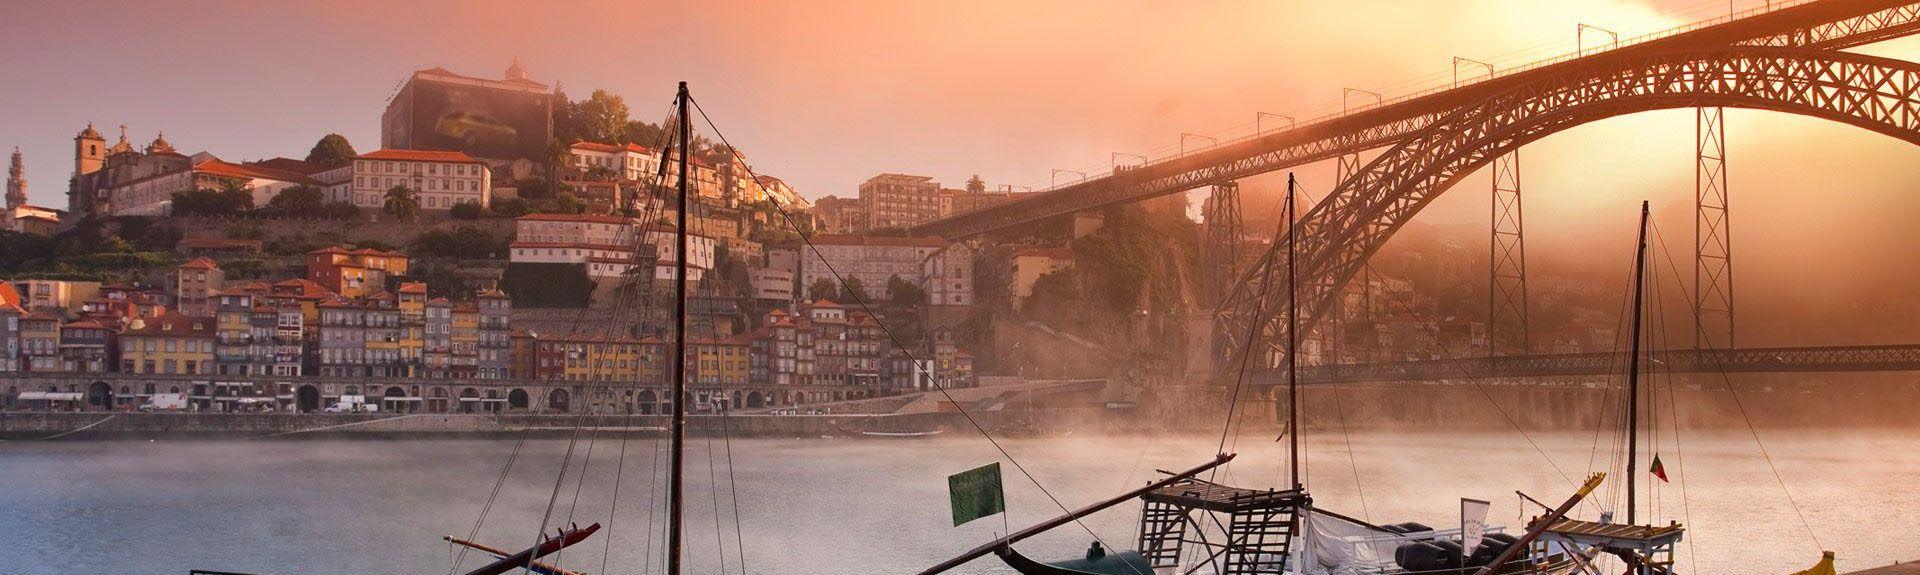 Ramalde, Porto, Porto, Portugal